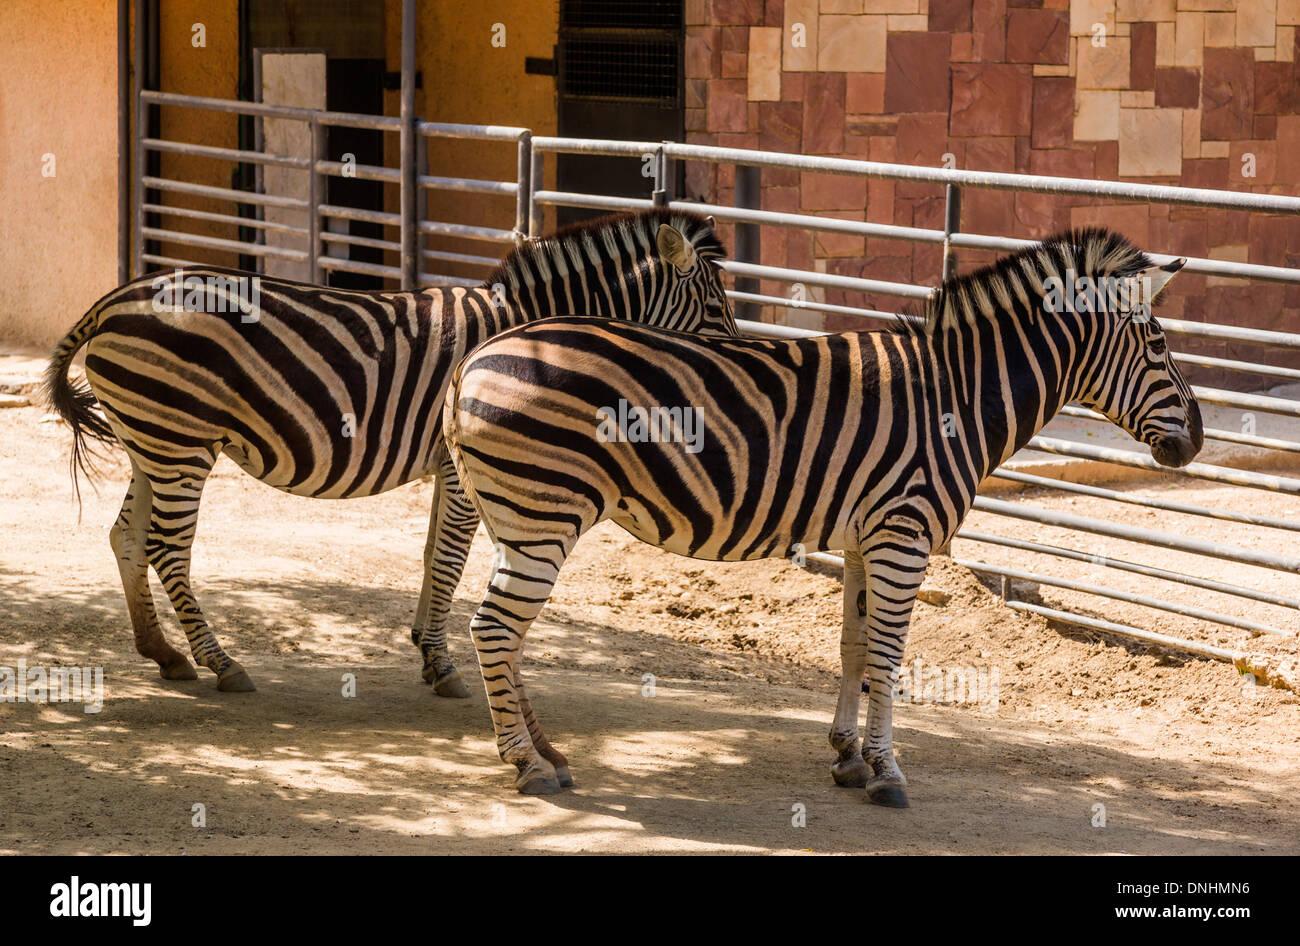 Chapman's zebras (Equus quagga chapmani) in a zoo, Barcelona Zoo, Barcelona, Catalonia, Spain Stock Photo